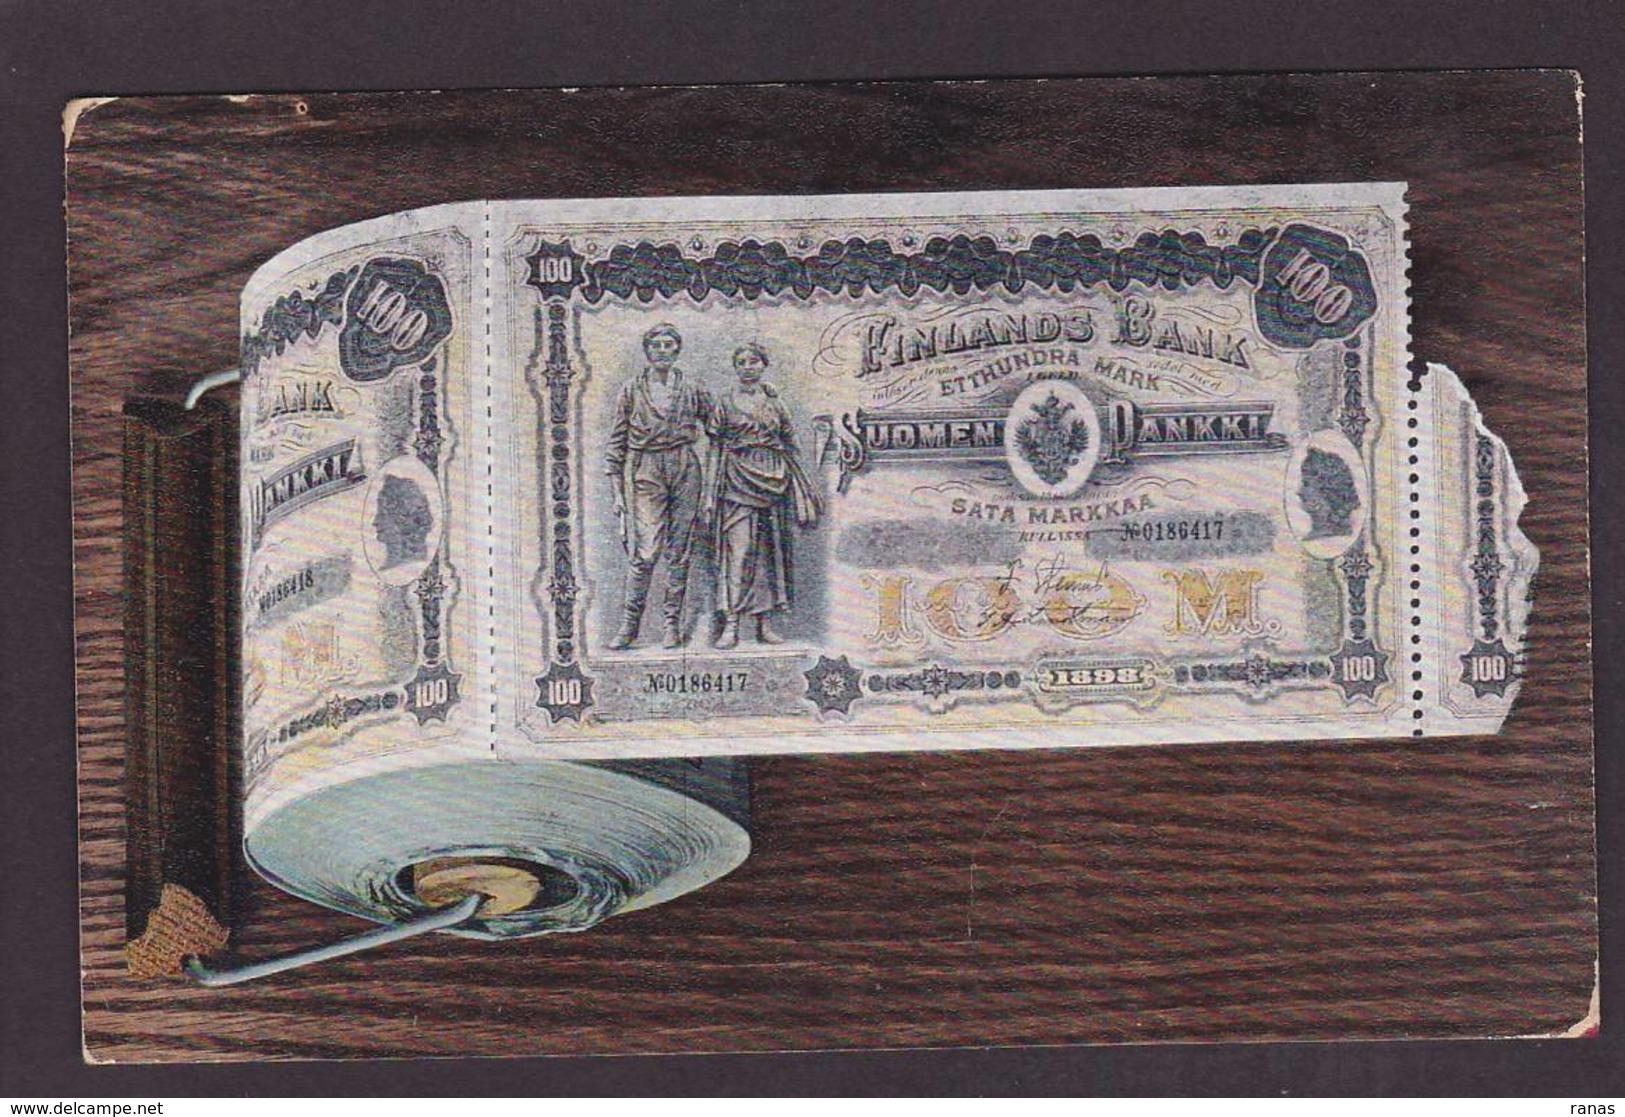 CPA Billet De Banque Banknote Circulé Finlande Finland Circulé Scatologie Satirique - Monnaies (représentations)